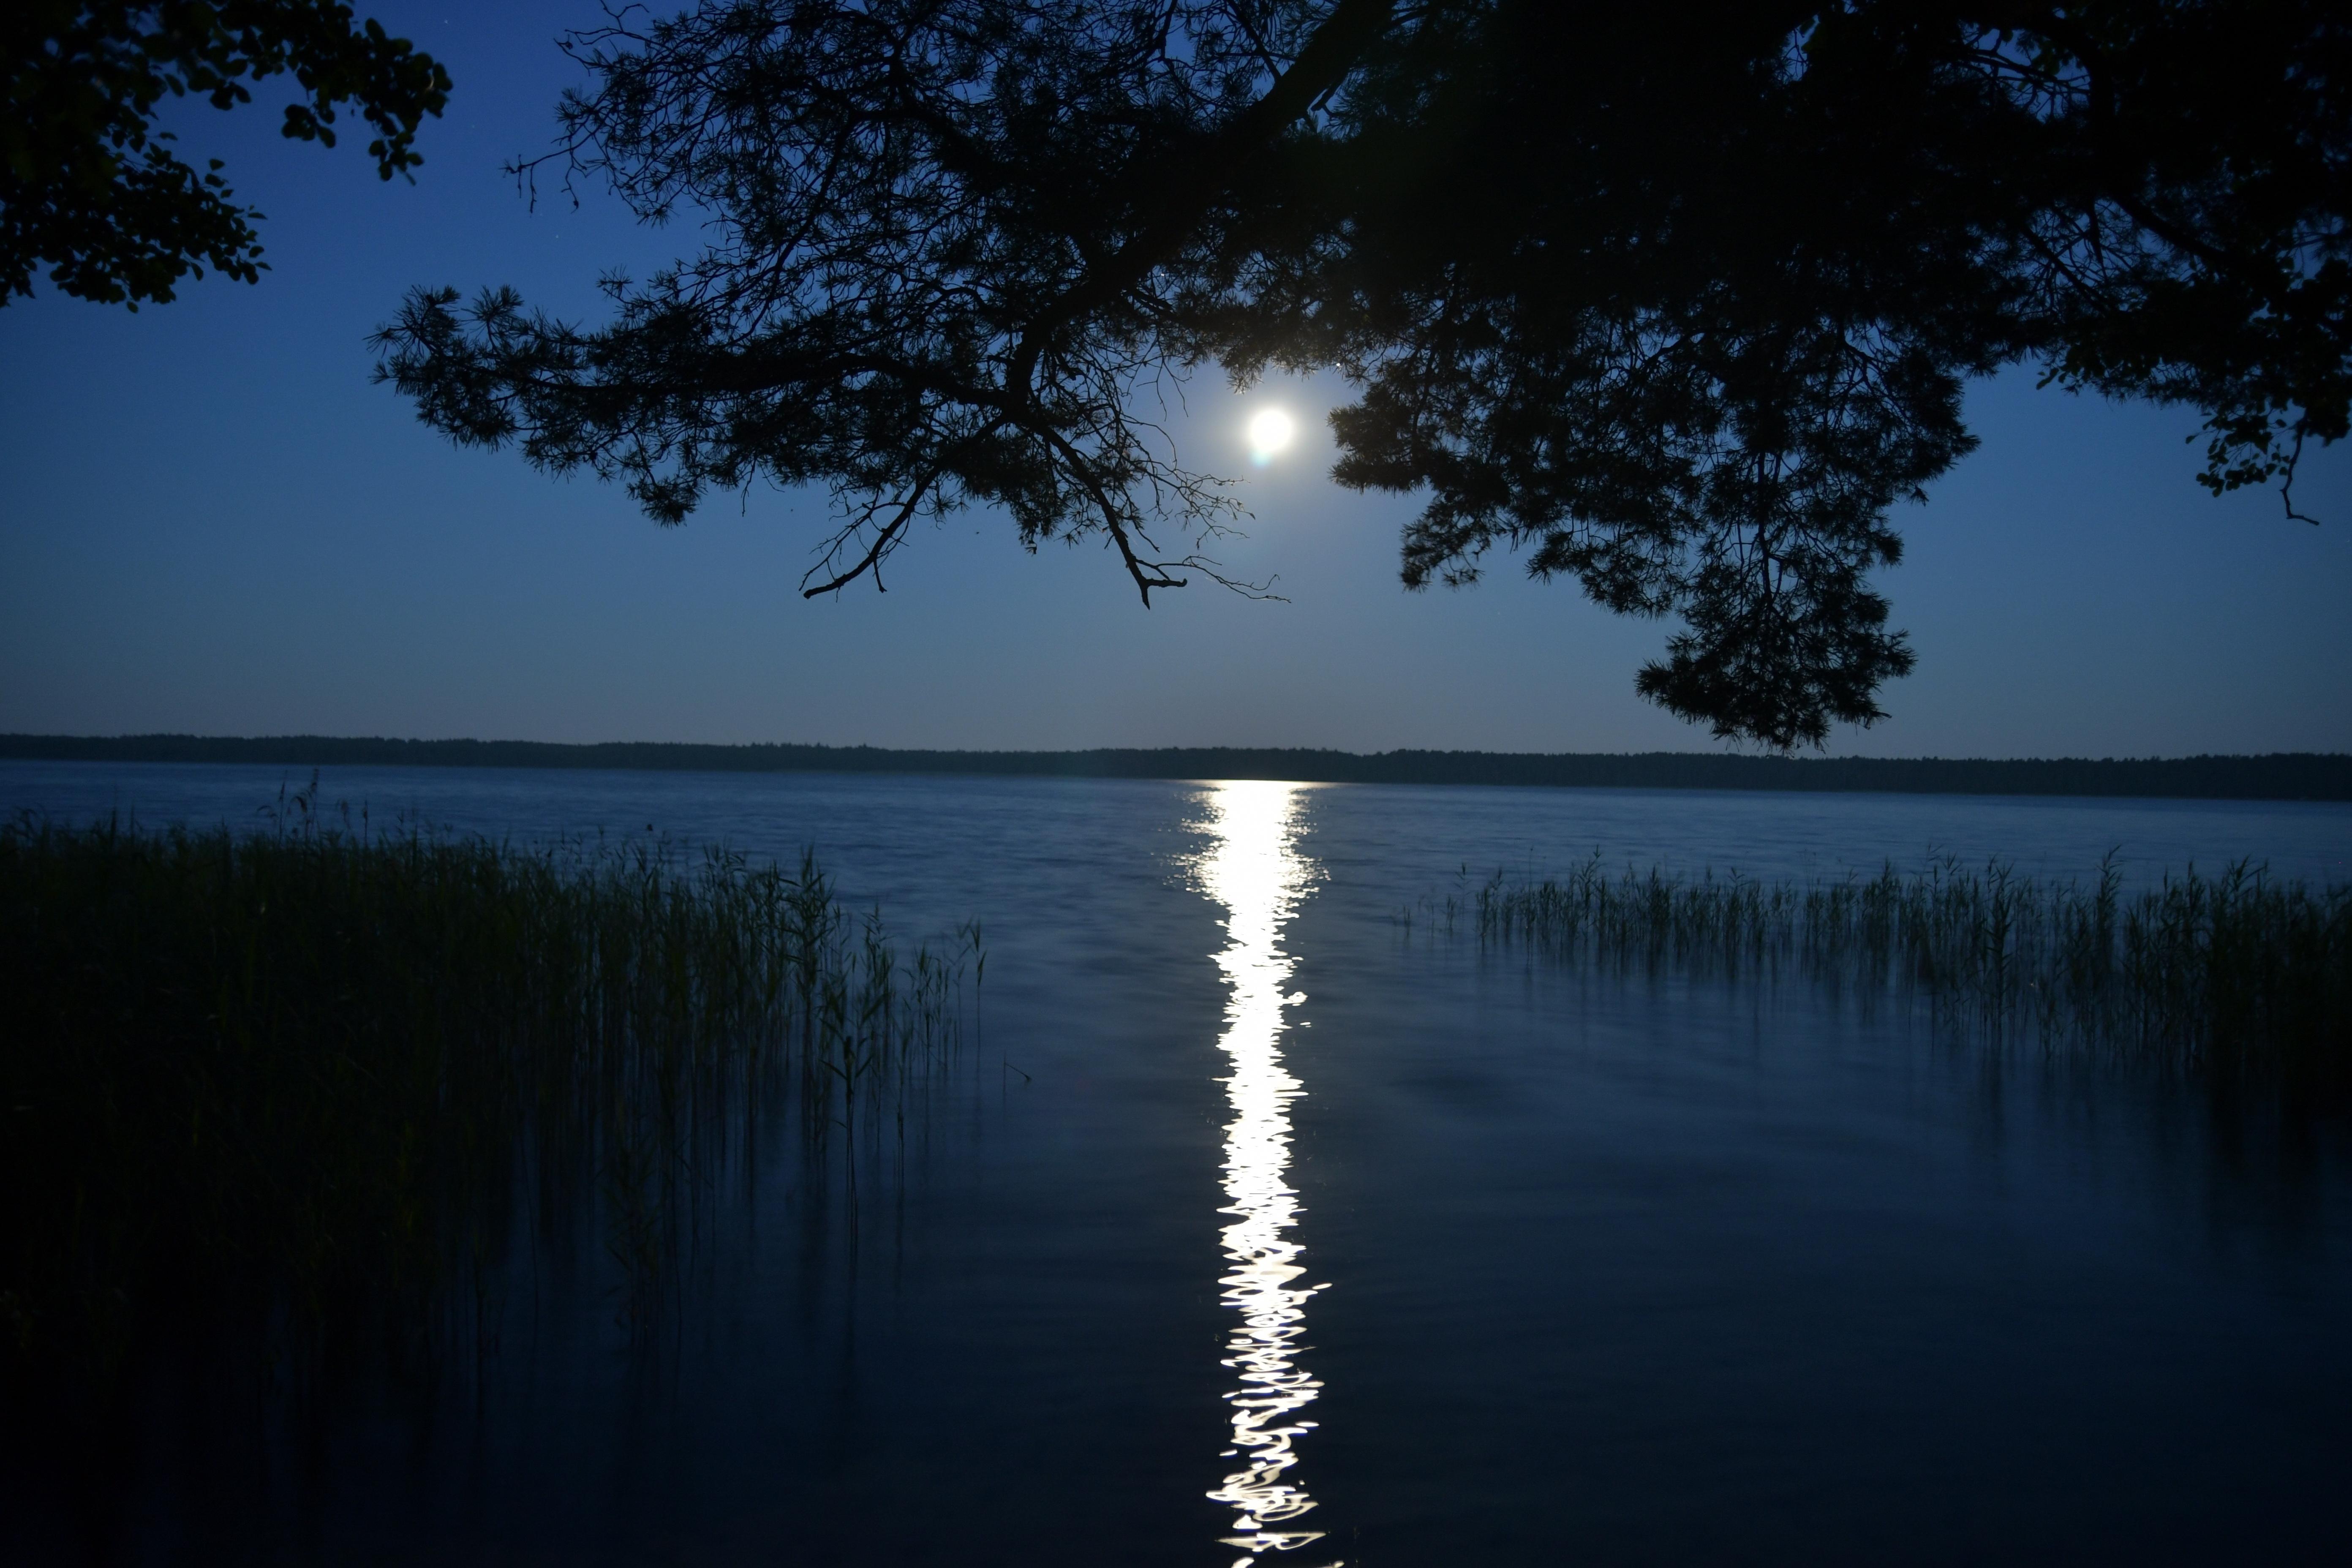 File:Rudka Volodymyretskyi Rivnenska-Rivnenskyi Nature Preserve-Bile lake-night view-3.jpg